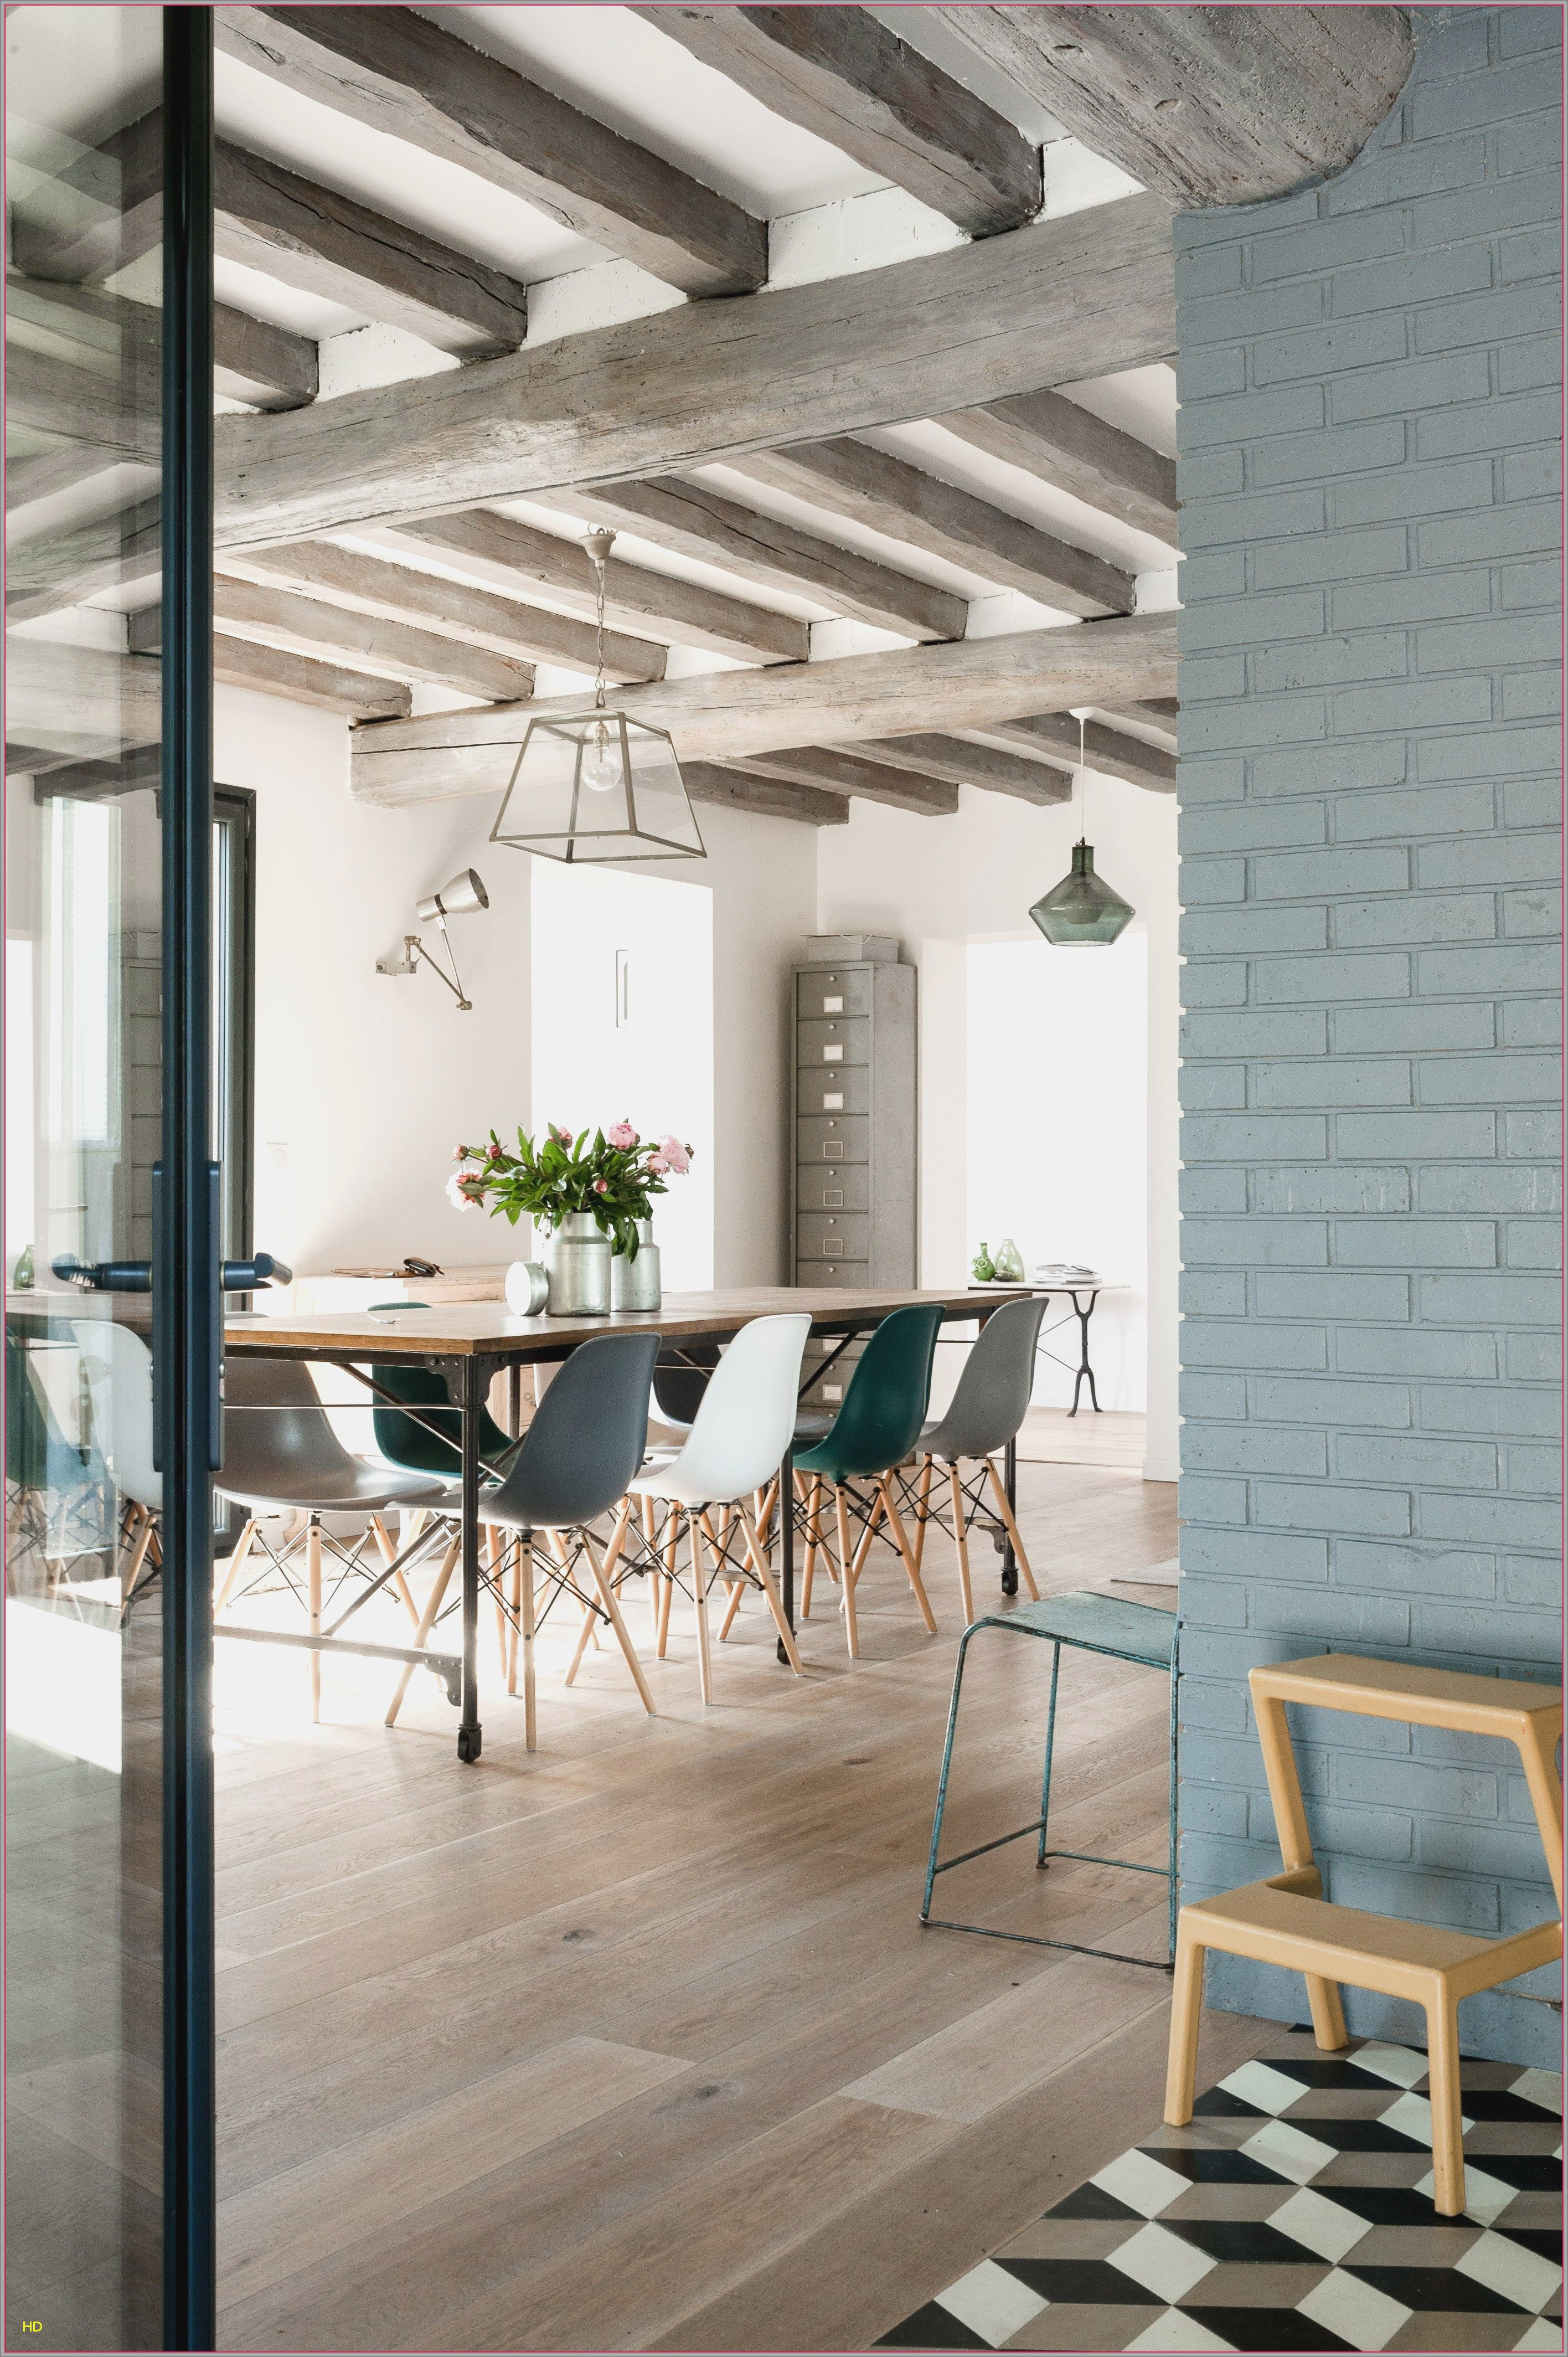 pied de lit en bois bel lit simple bois massif banquette. Black Bedroom Furniture Sets. Home Design Ideas